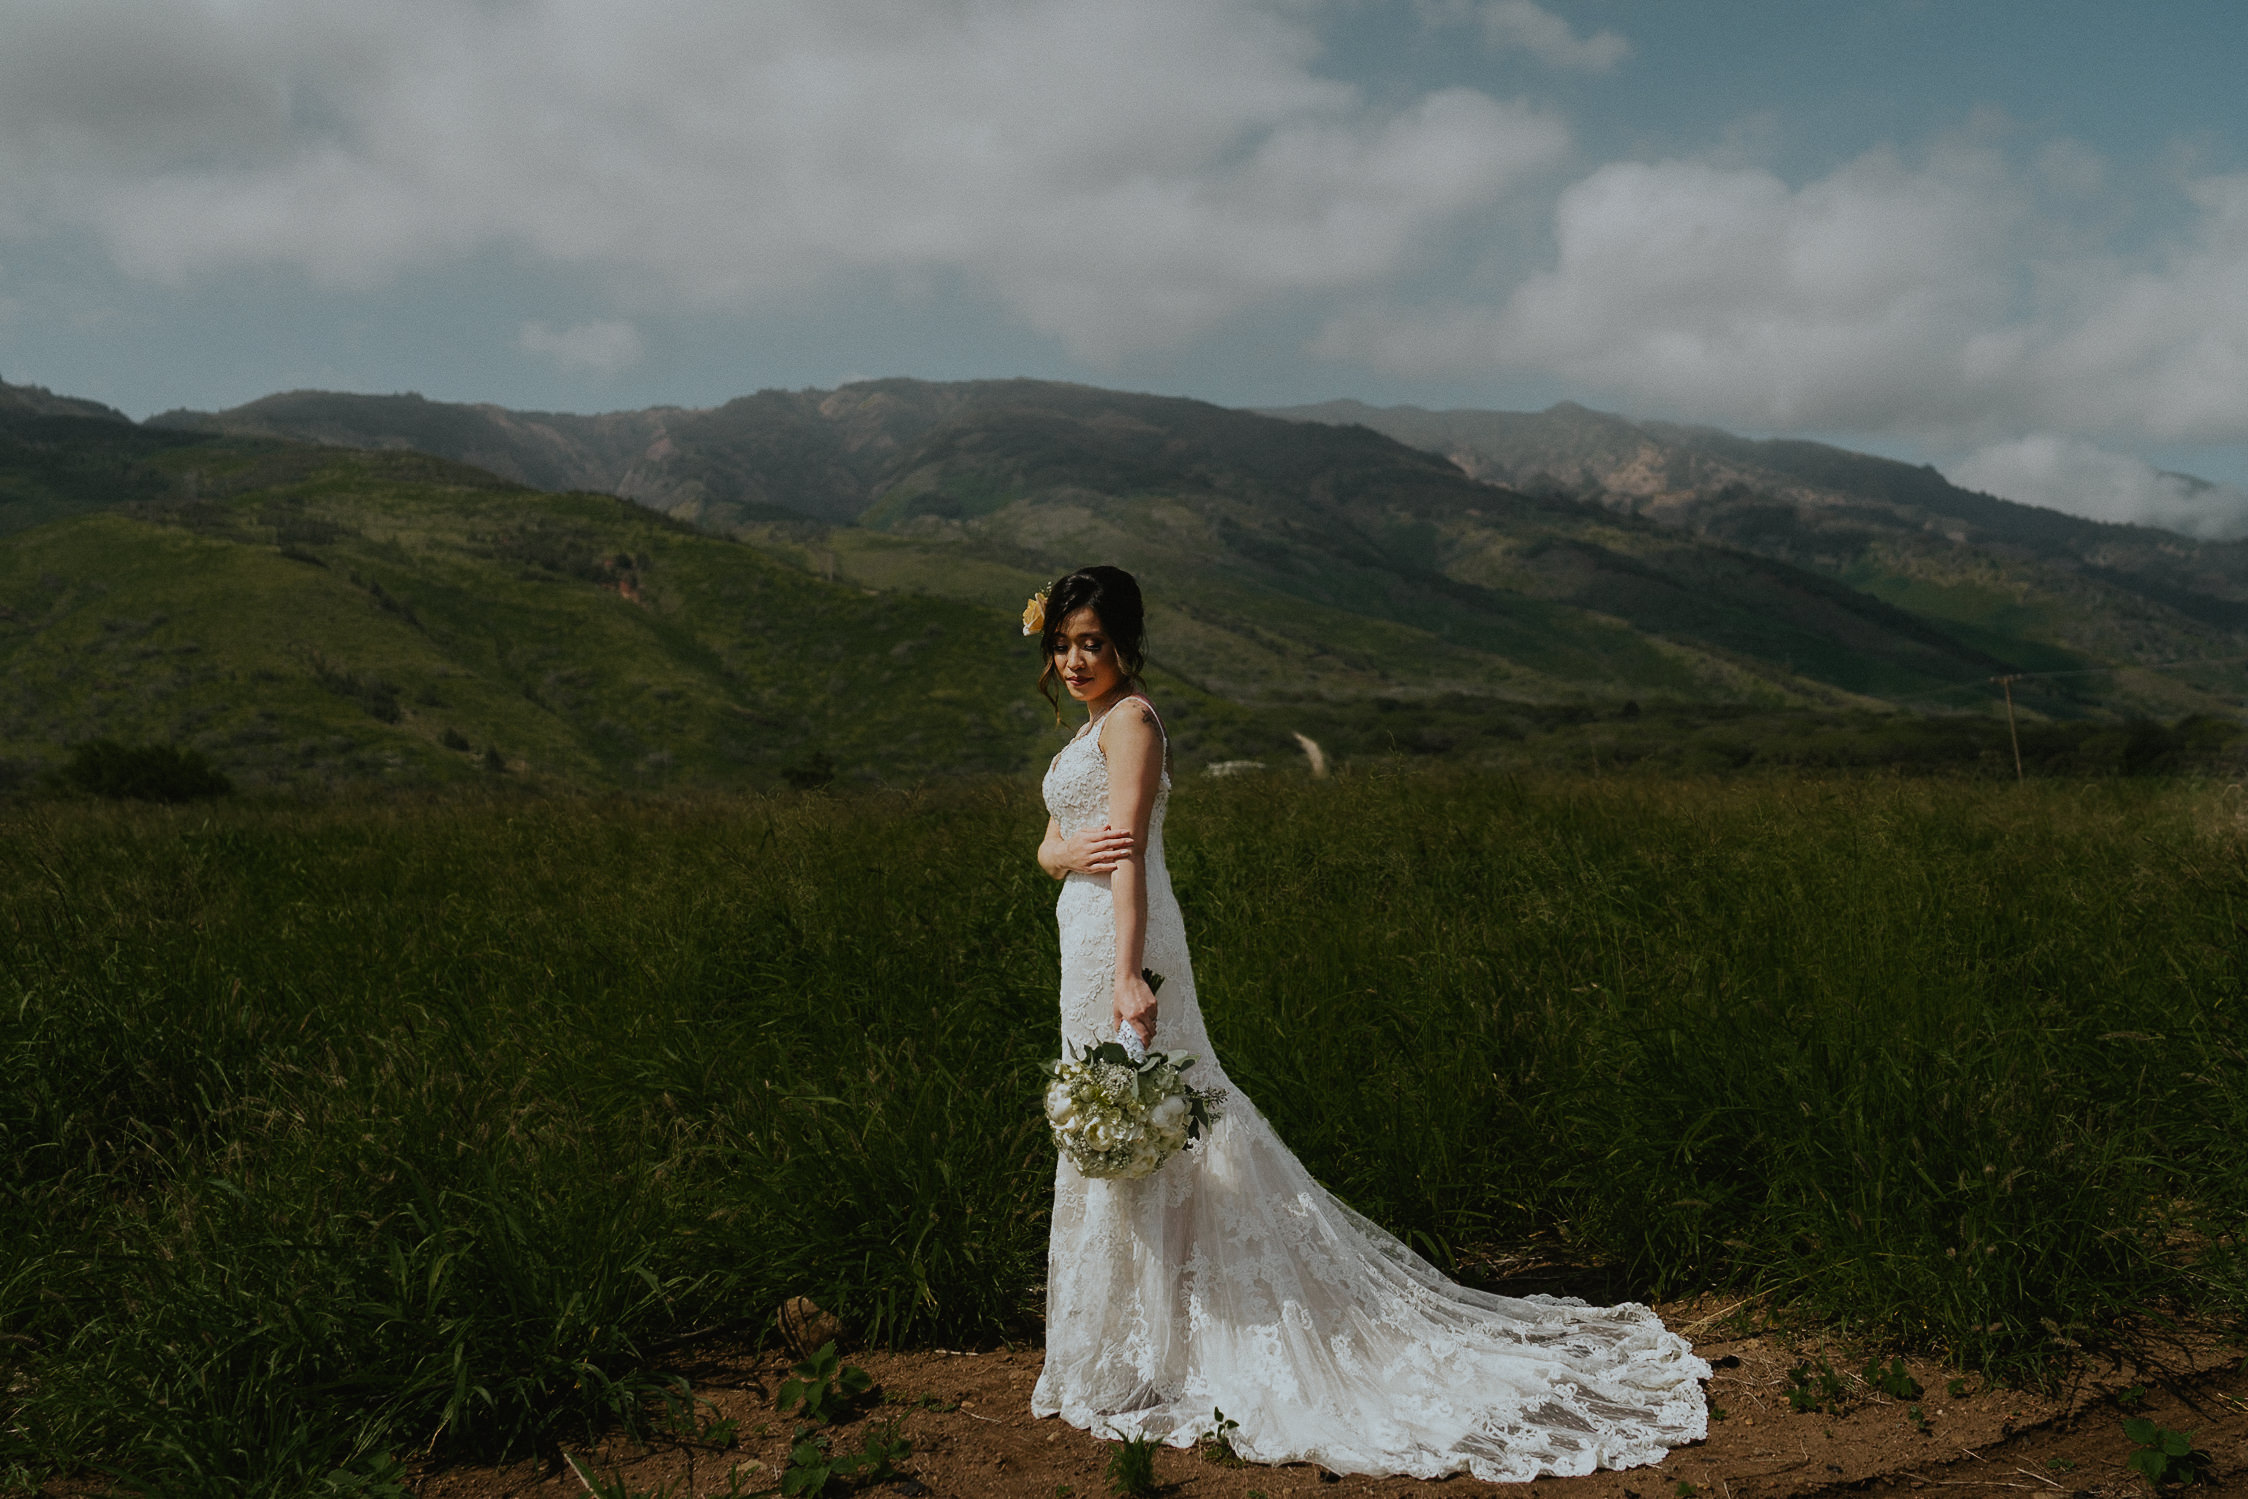 Maui_Destination_wedding_Alfred_Tang-07321.jpg